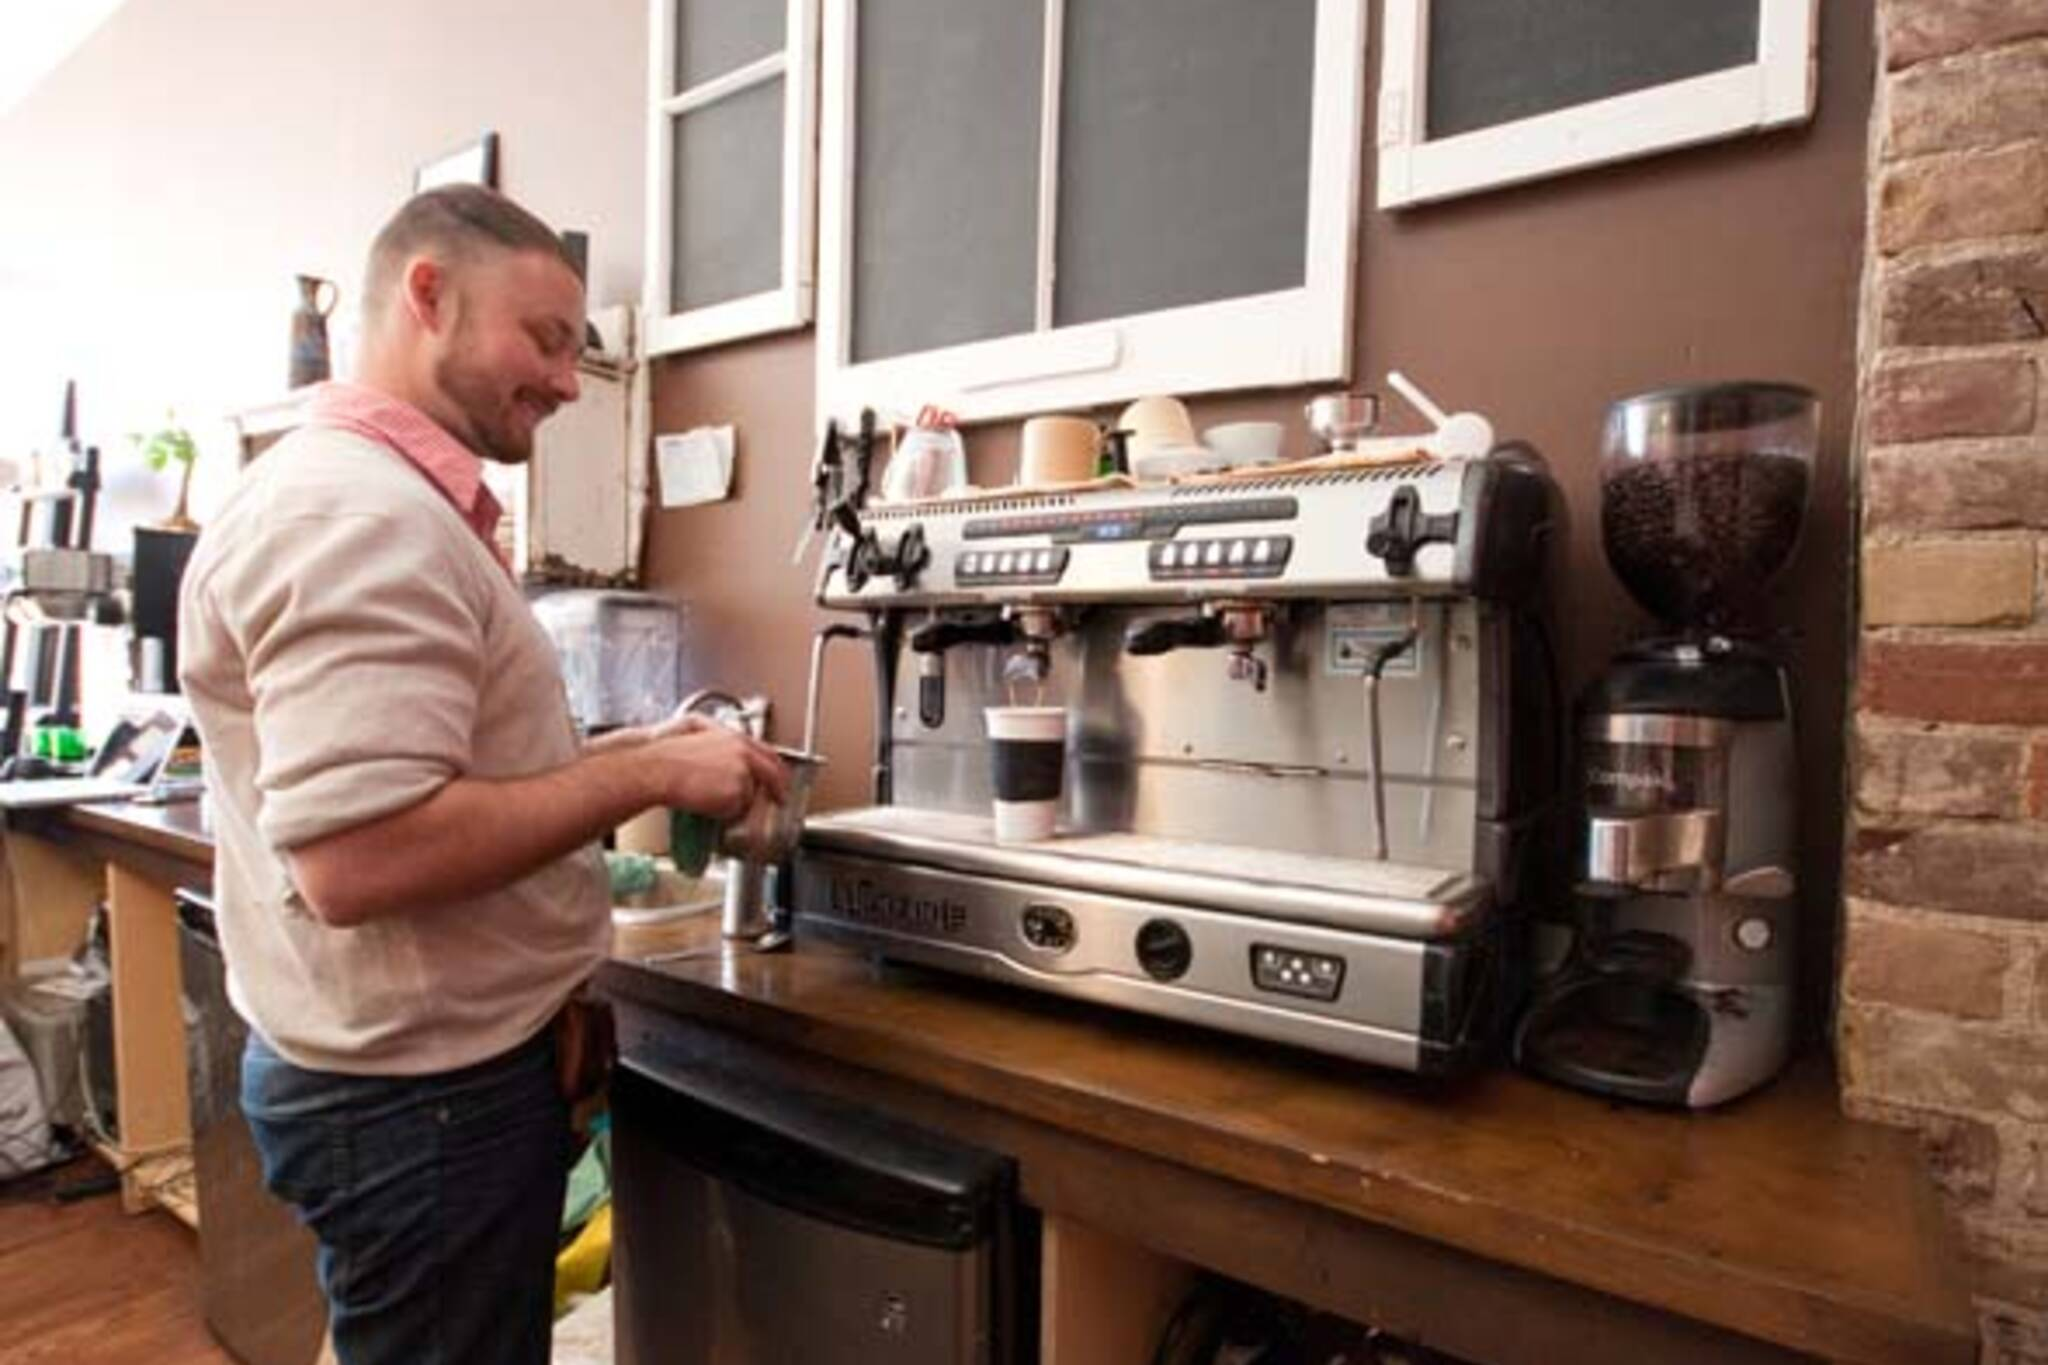 Redline Coffee and Espresso Bar